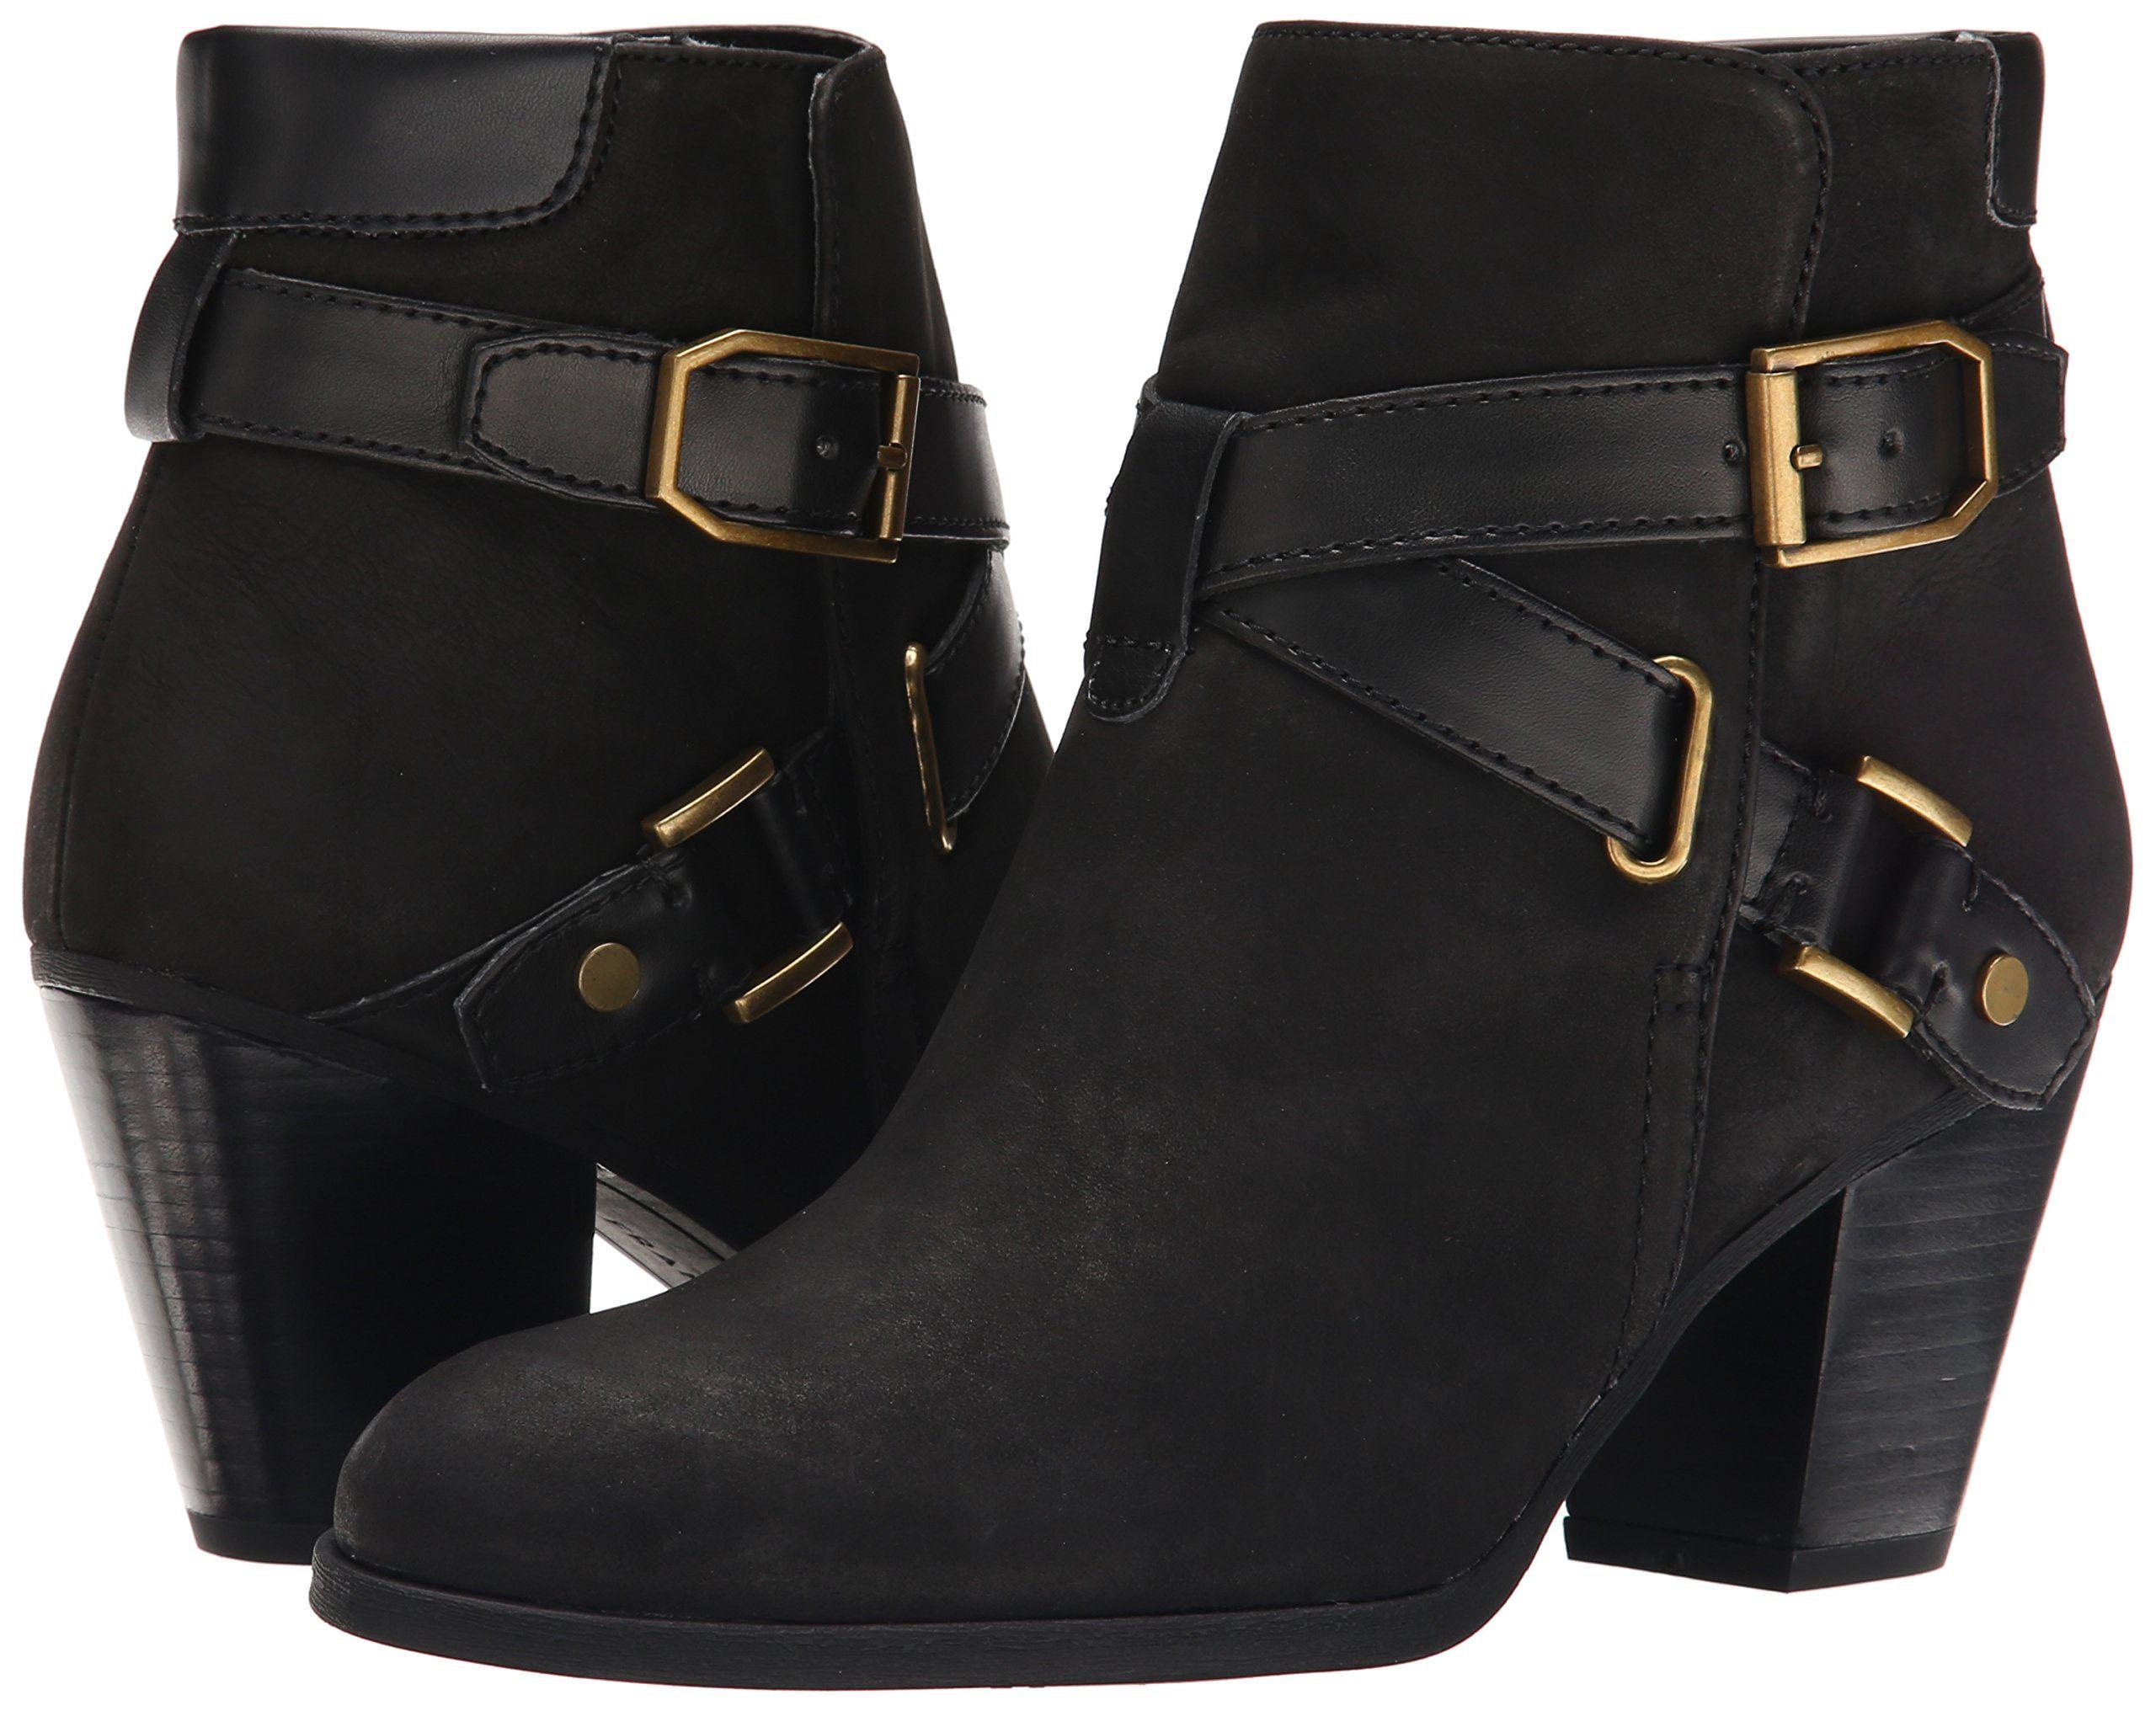 148588d54c5 Amazon.com: Franco Sarto Women's Delight Boot: Clothing | My Inner ...